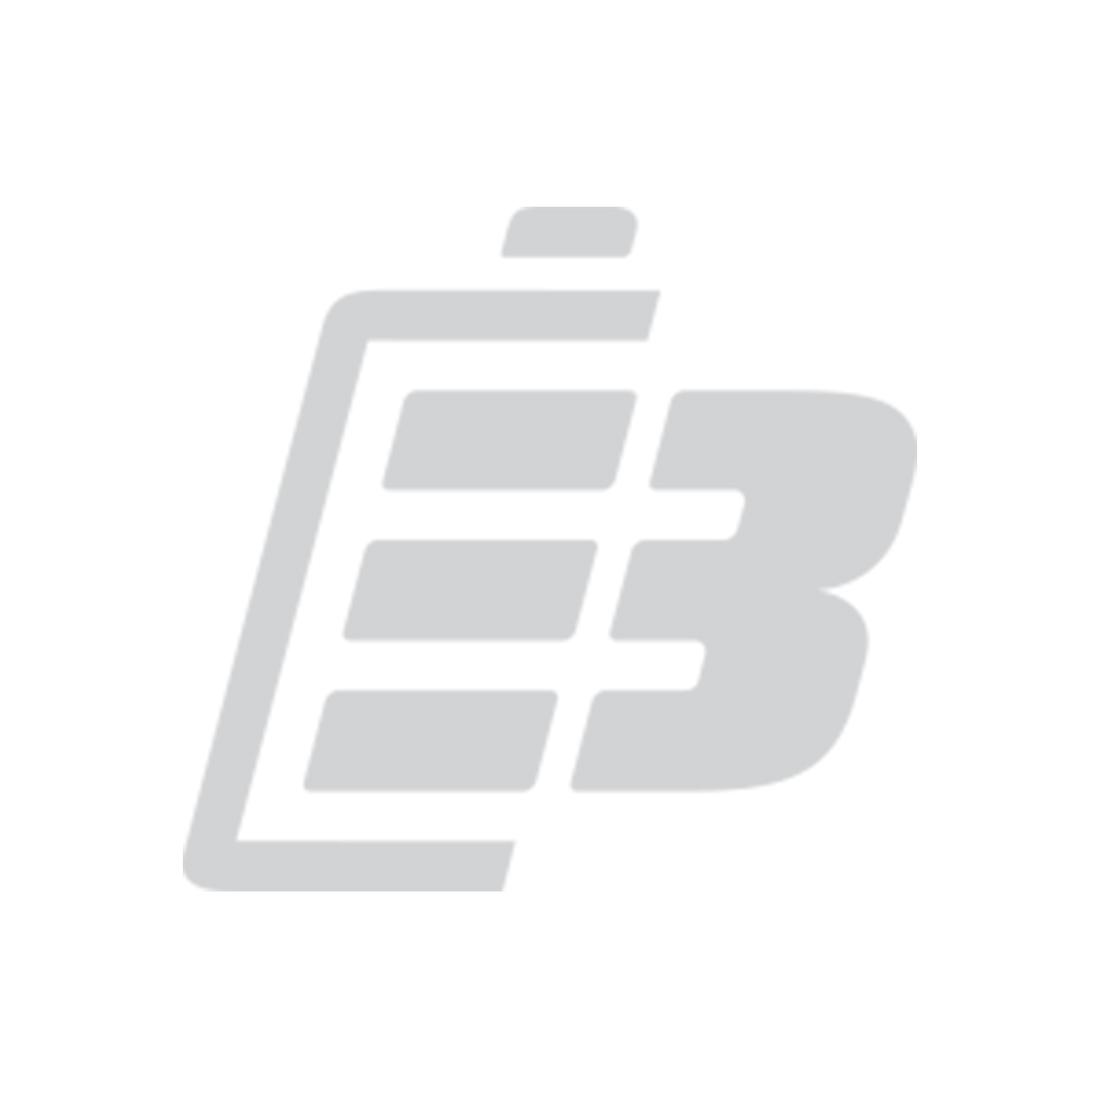 E-book reader battery Sony PRS-600_1